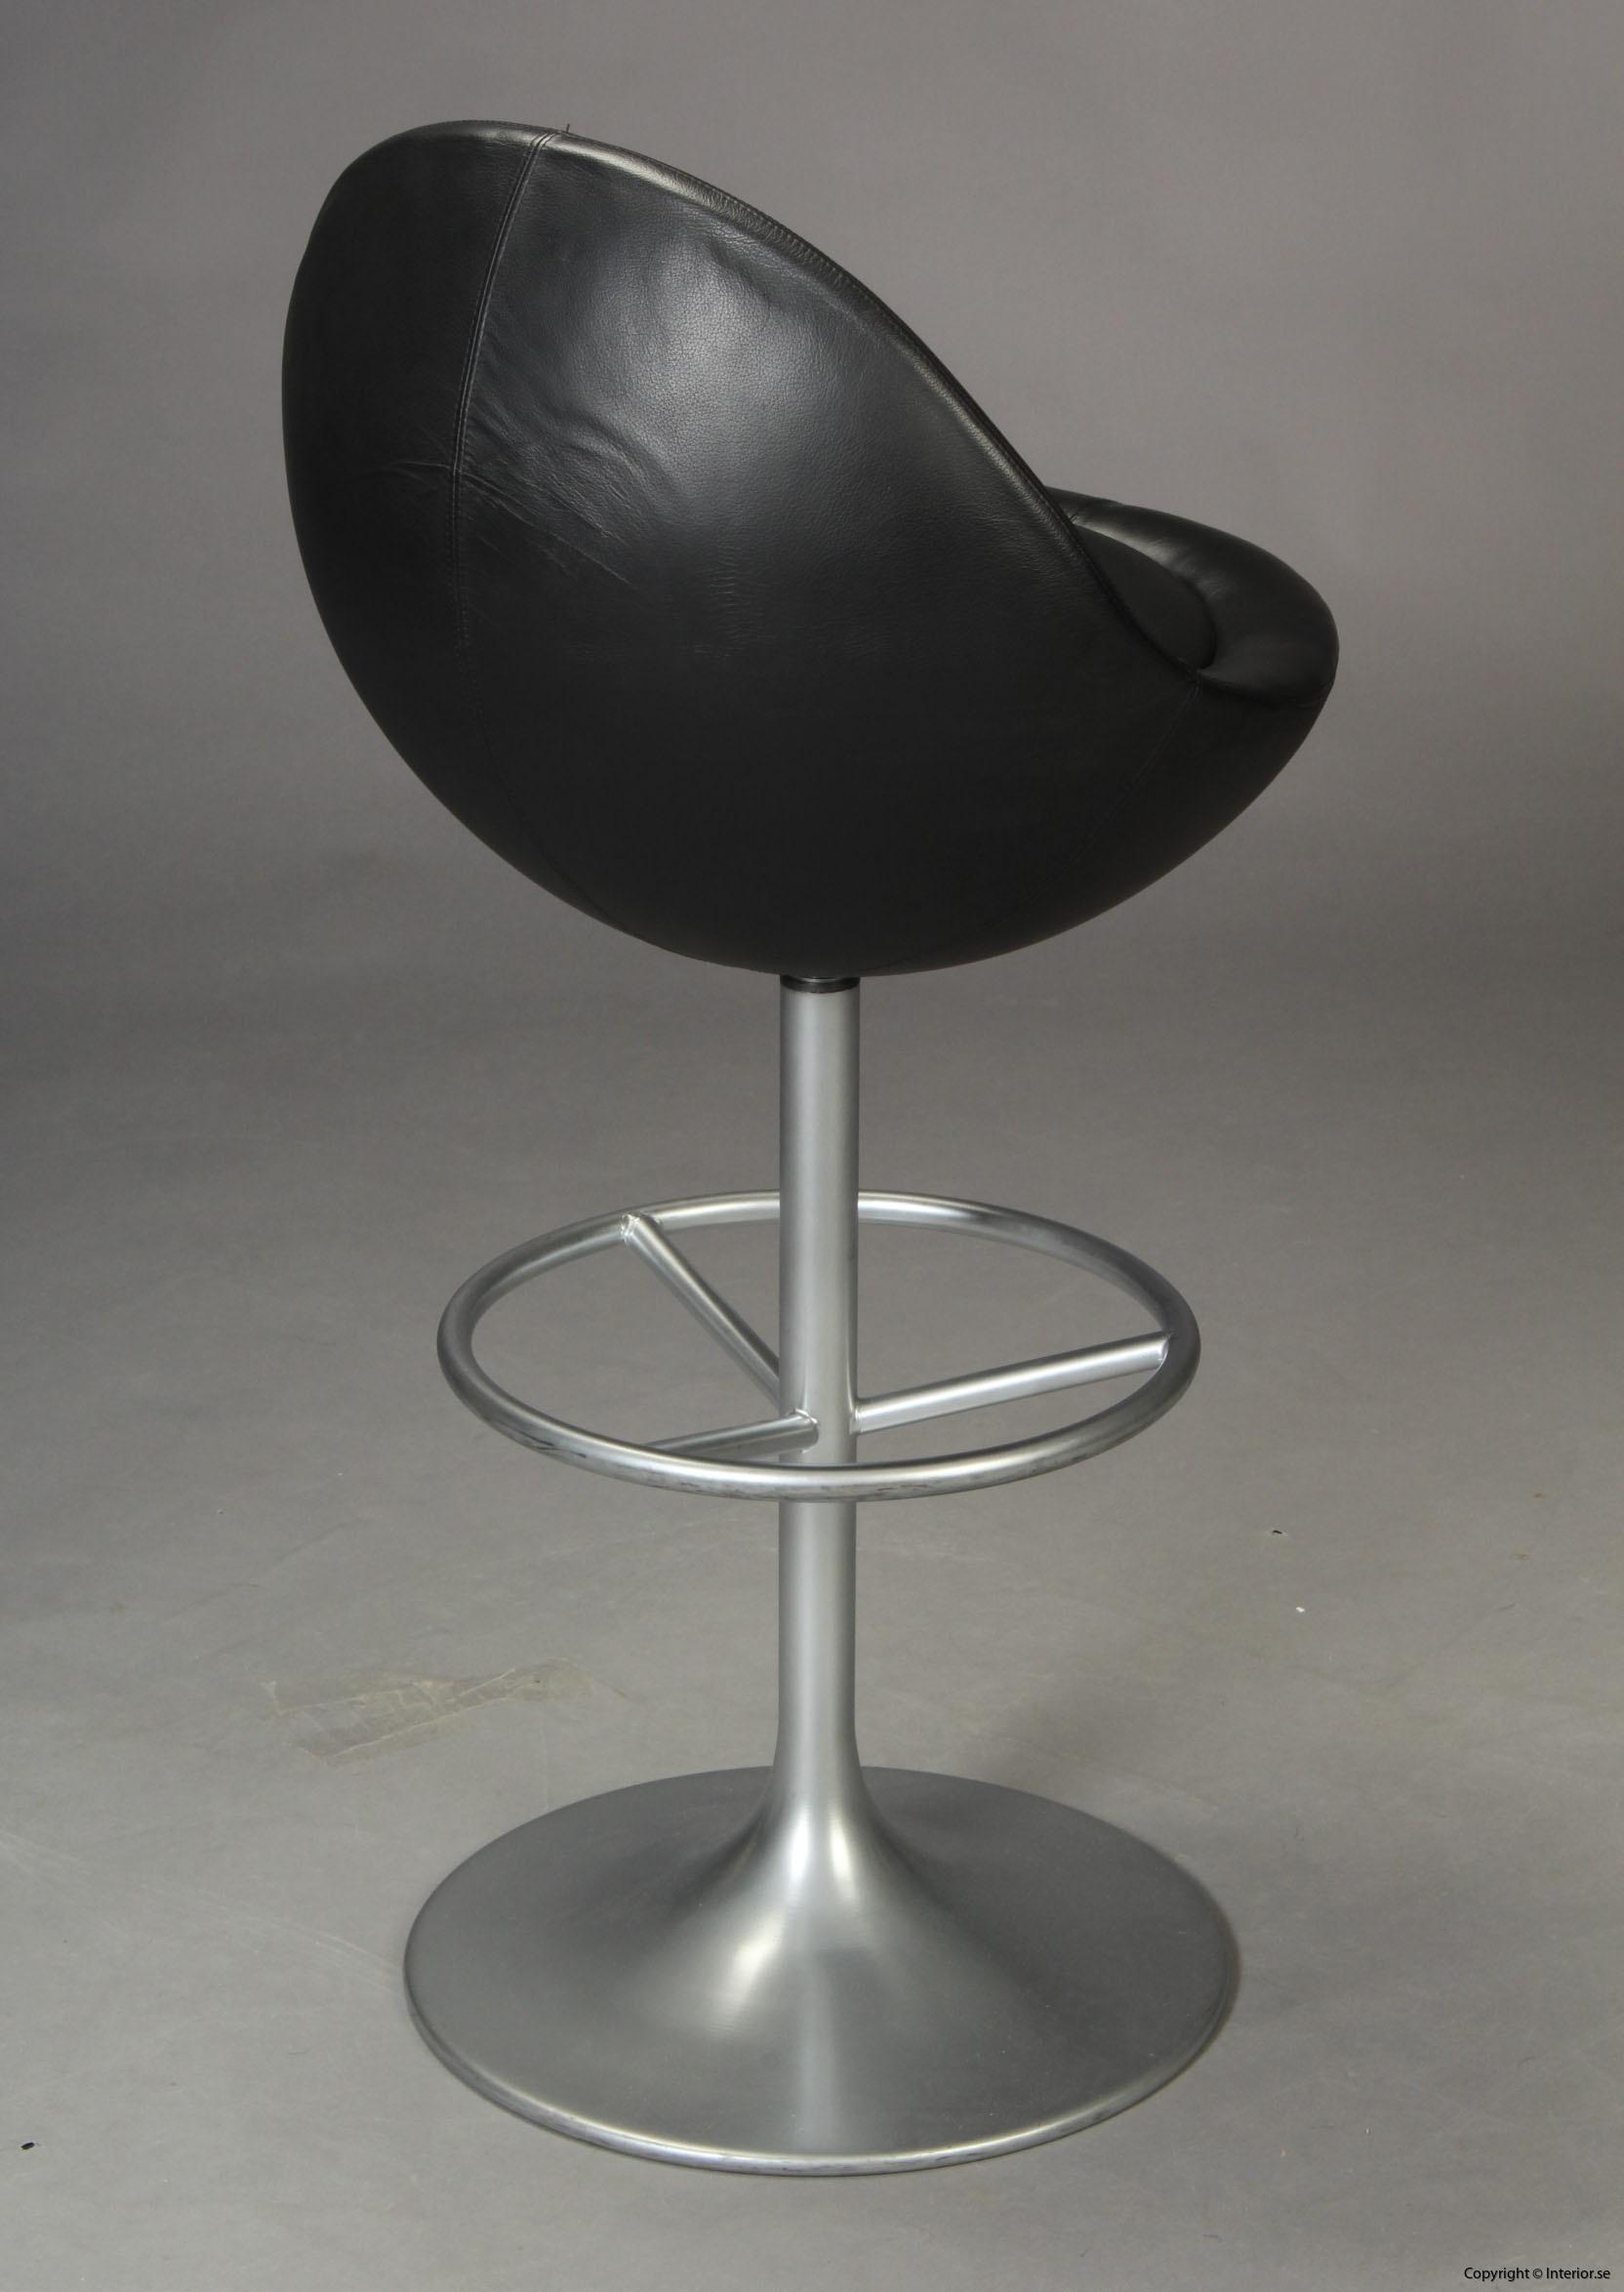 1 Johanson Design venus barstol (7)